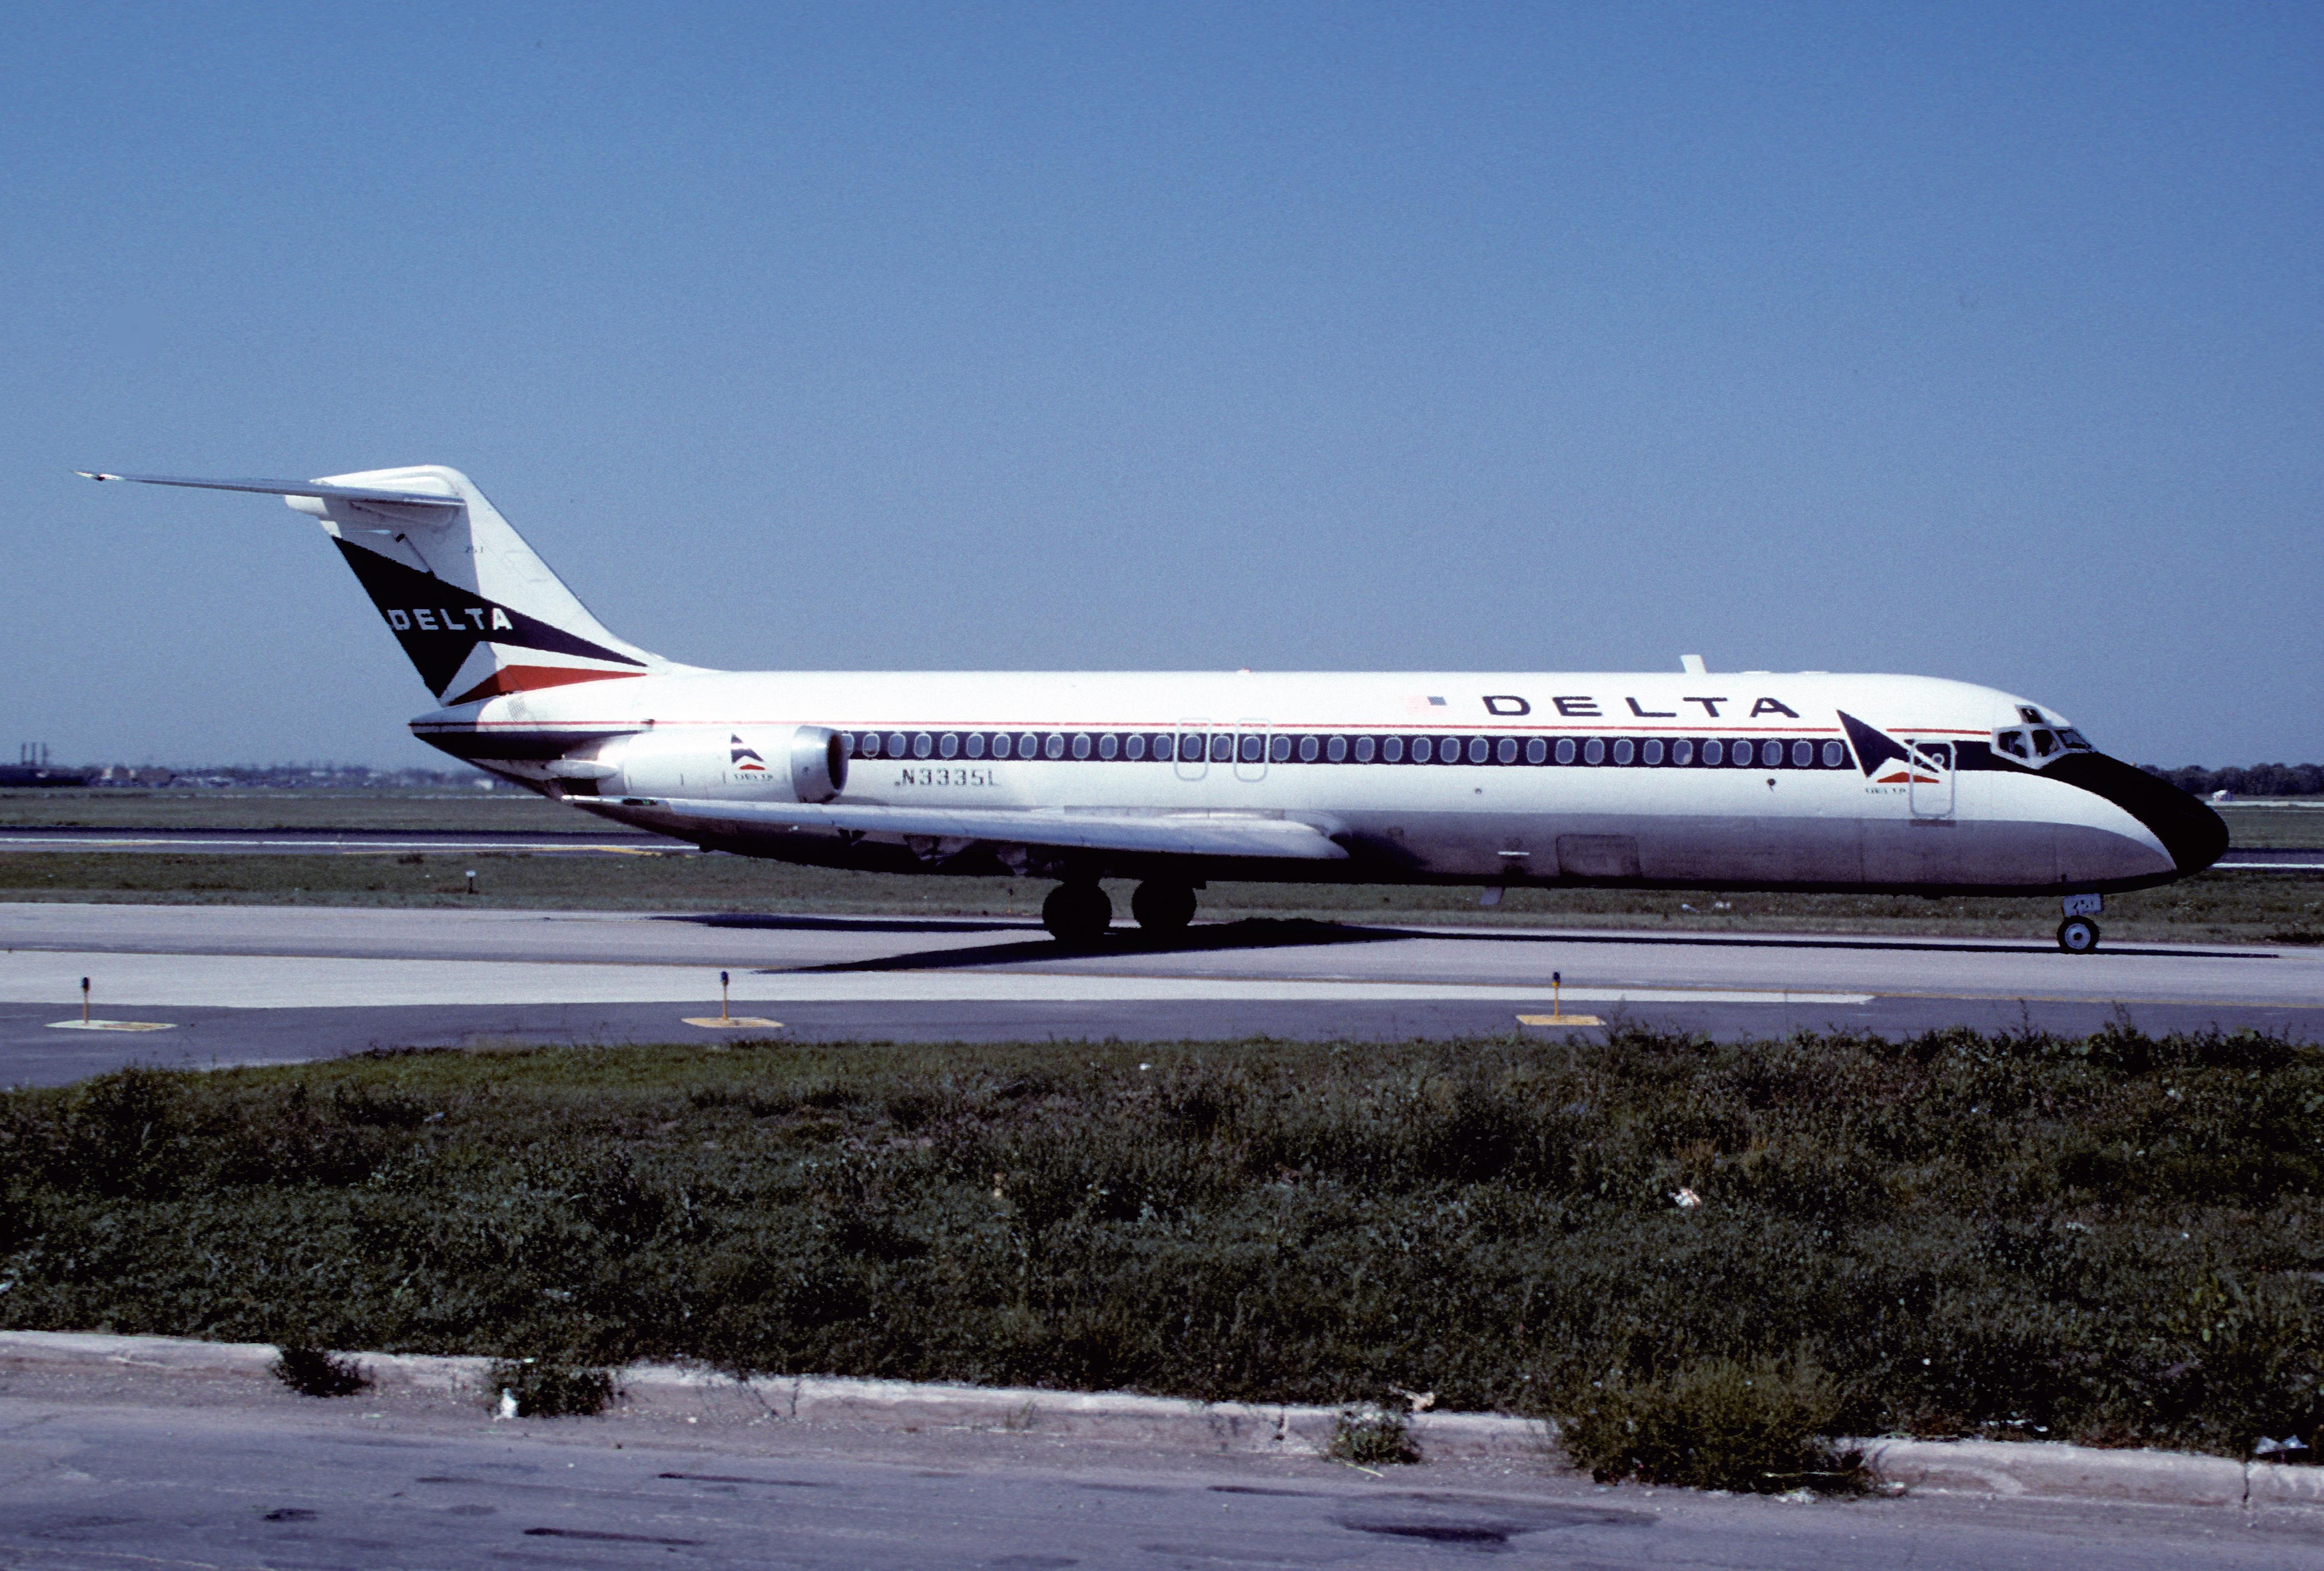 Filedelta air lines dc 9 32 n3335lord october 1988 atn filedelta air lines dc 9 32 n3335lord october publicscrutiny Gallery